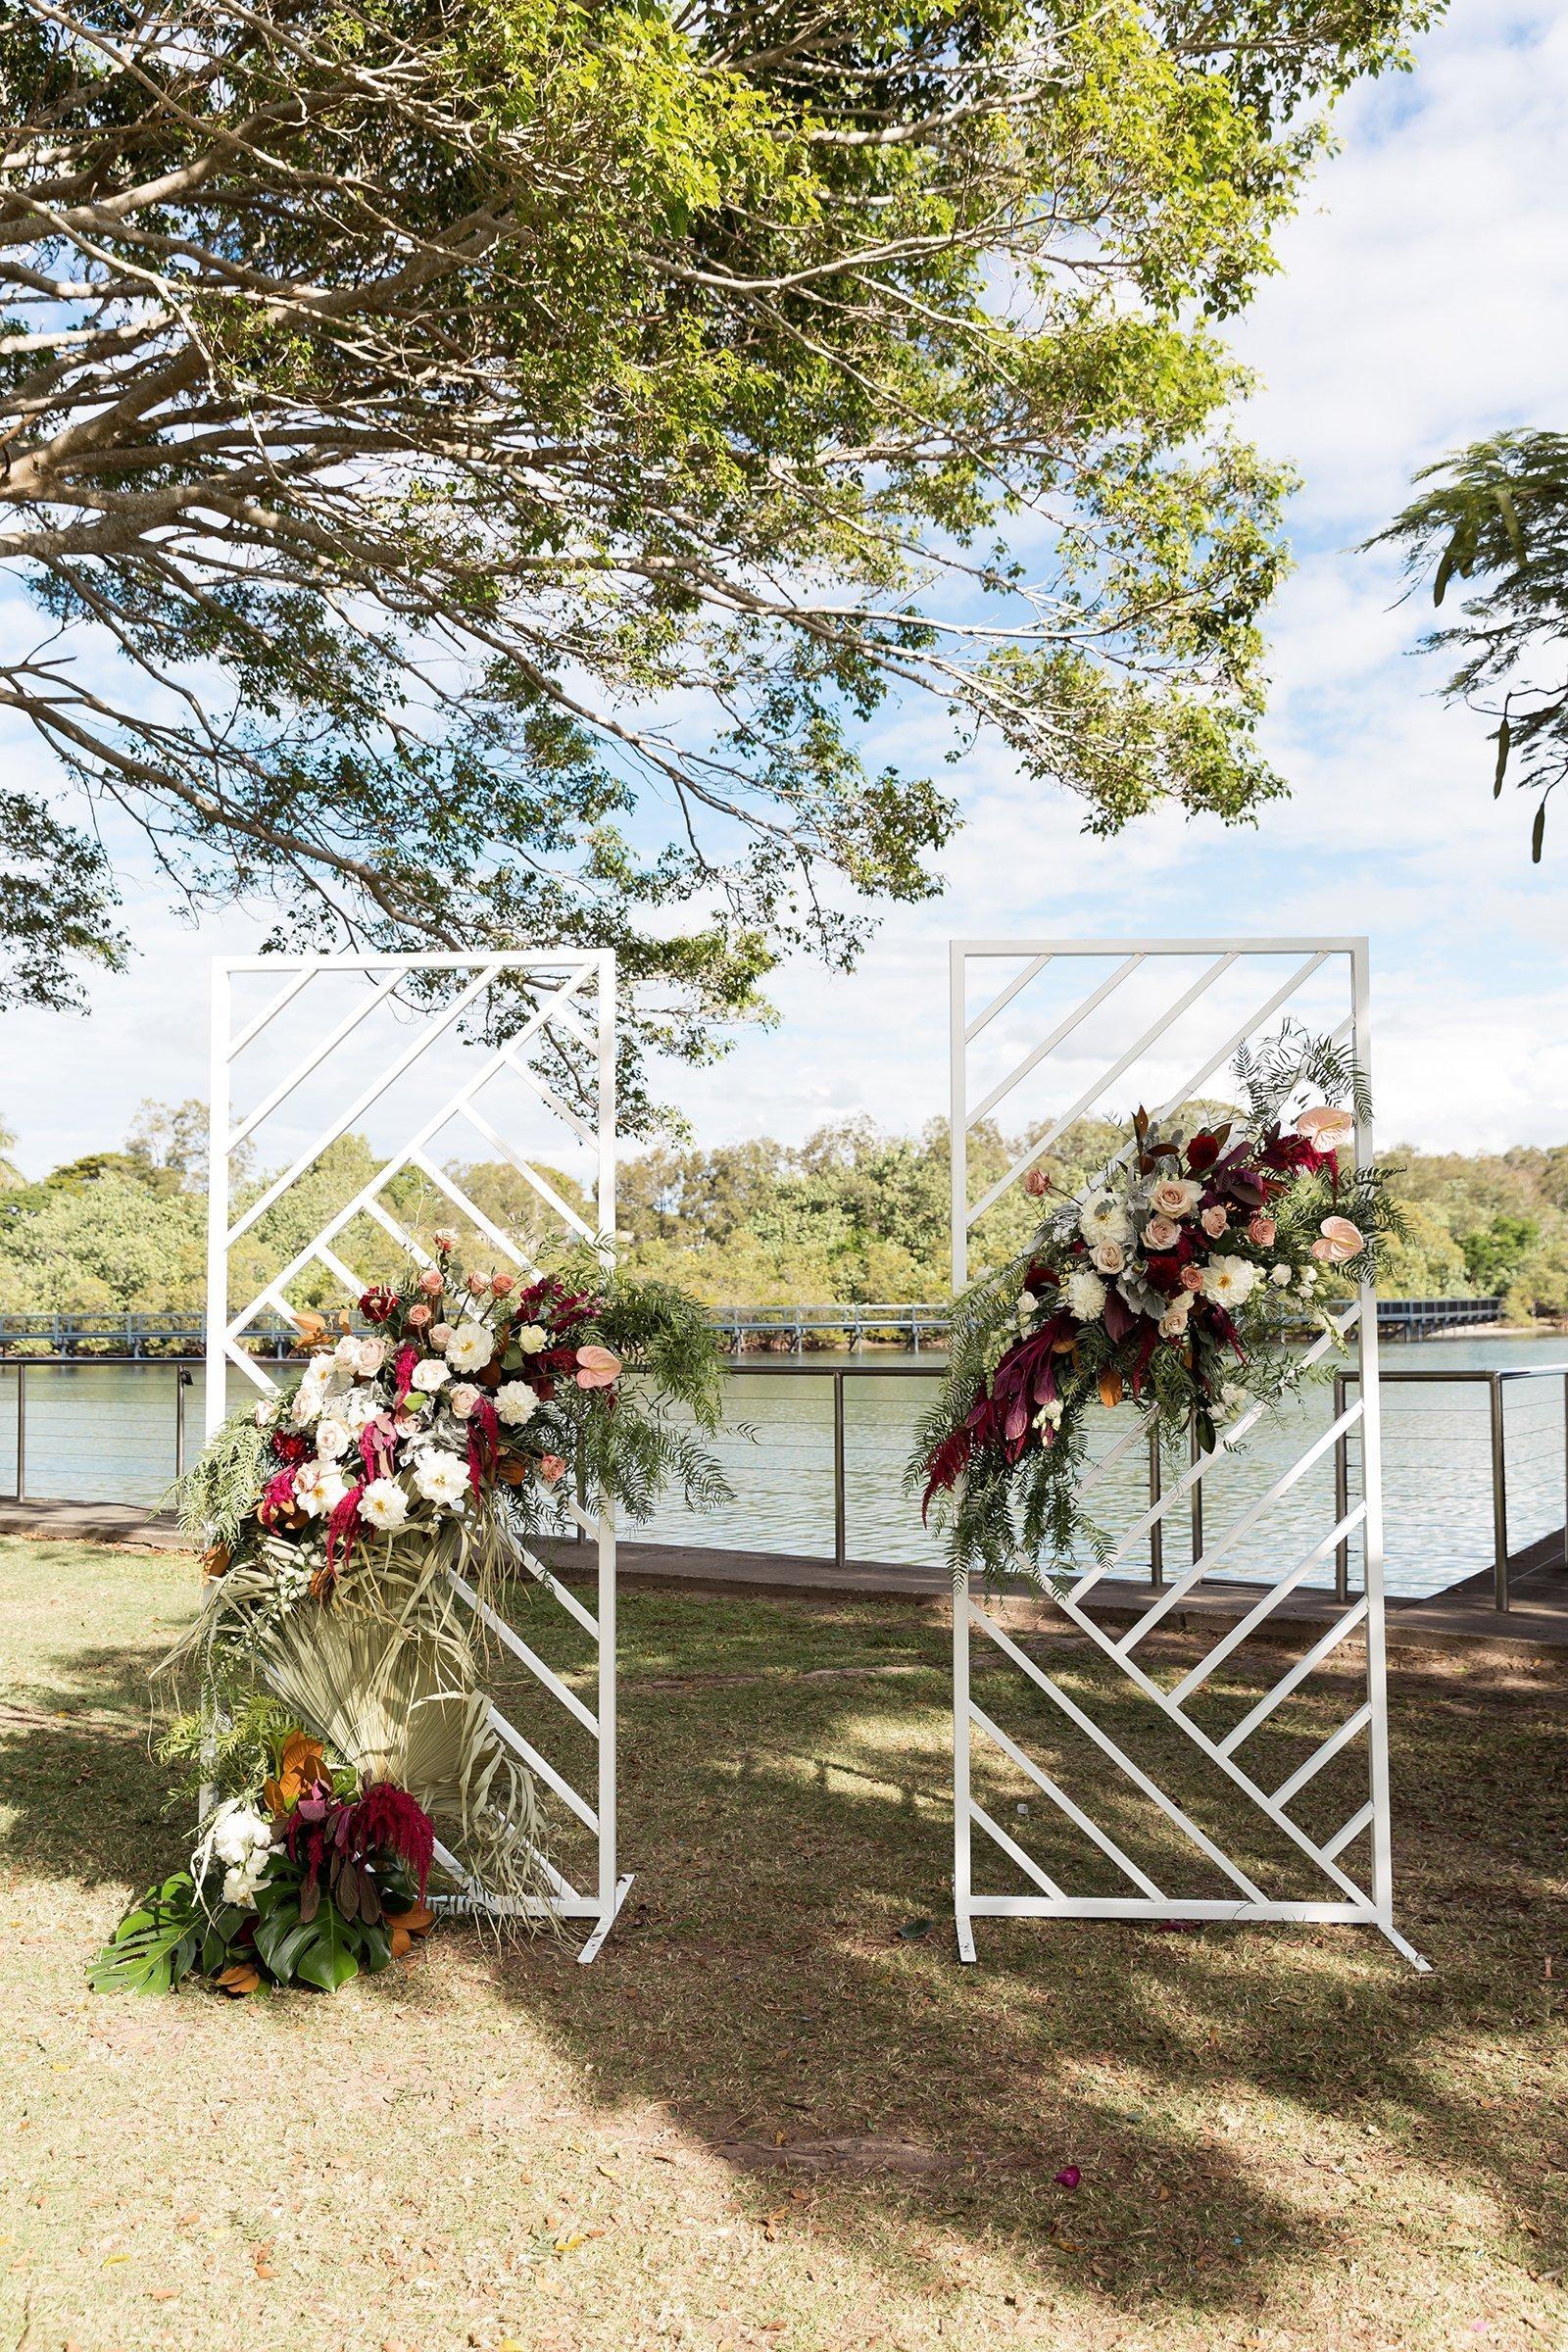 ancora-weddings-casuarina-wedding-venue-dani-chris-DaniChris_Ancora-192.jpg